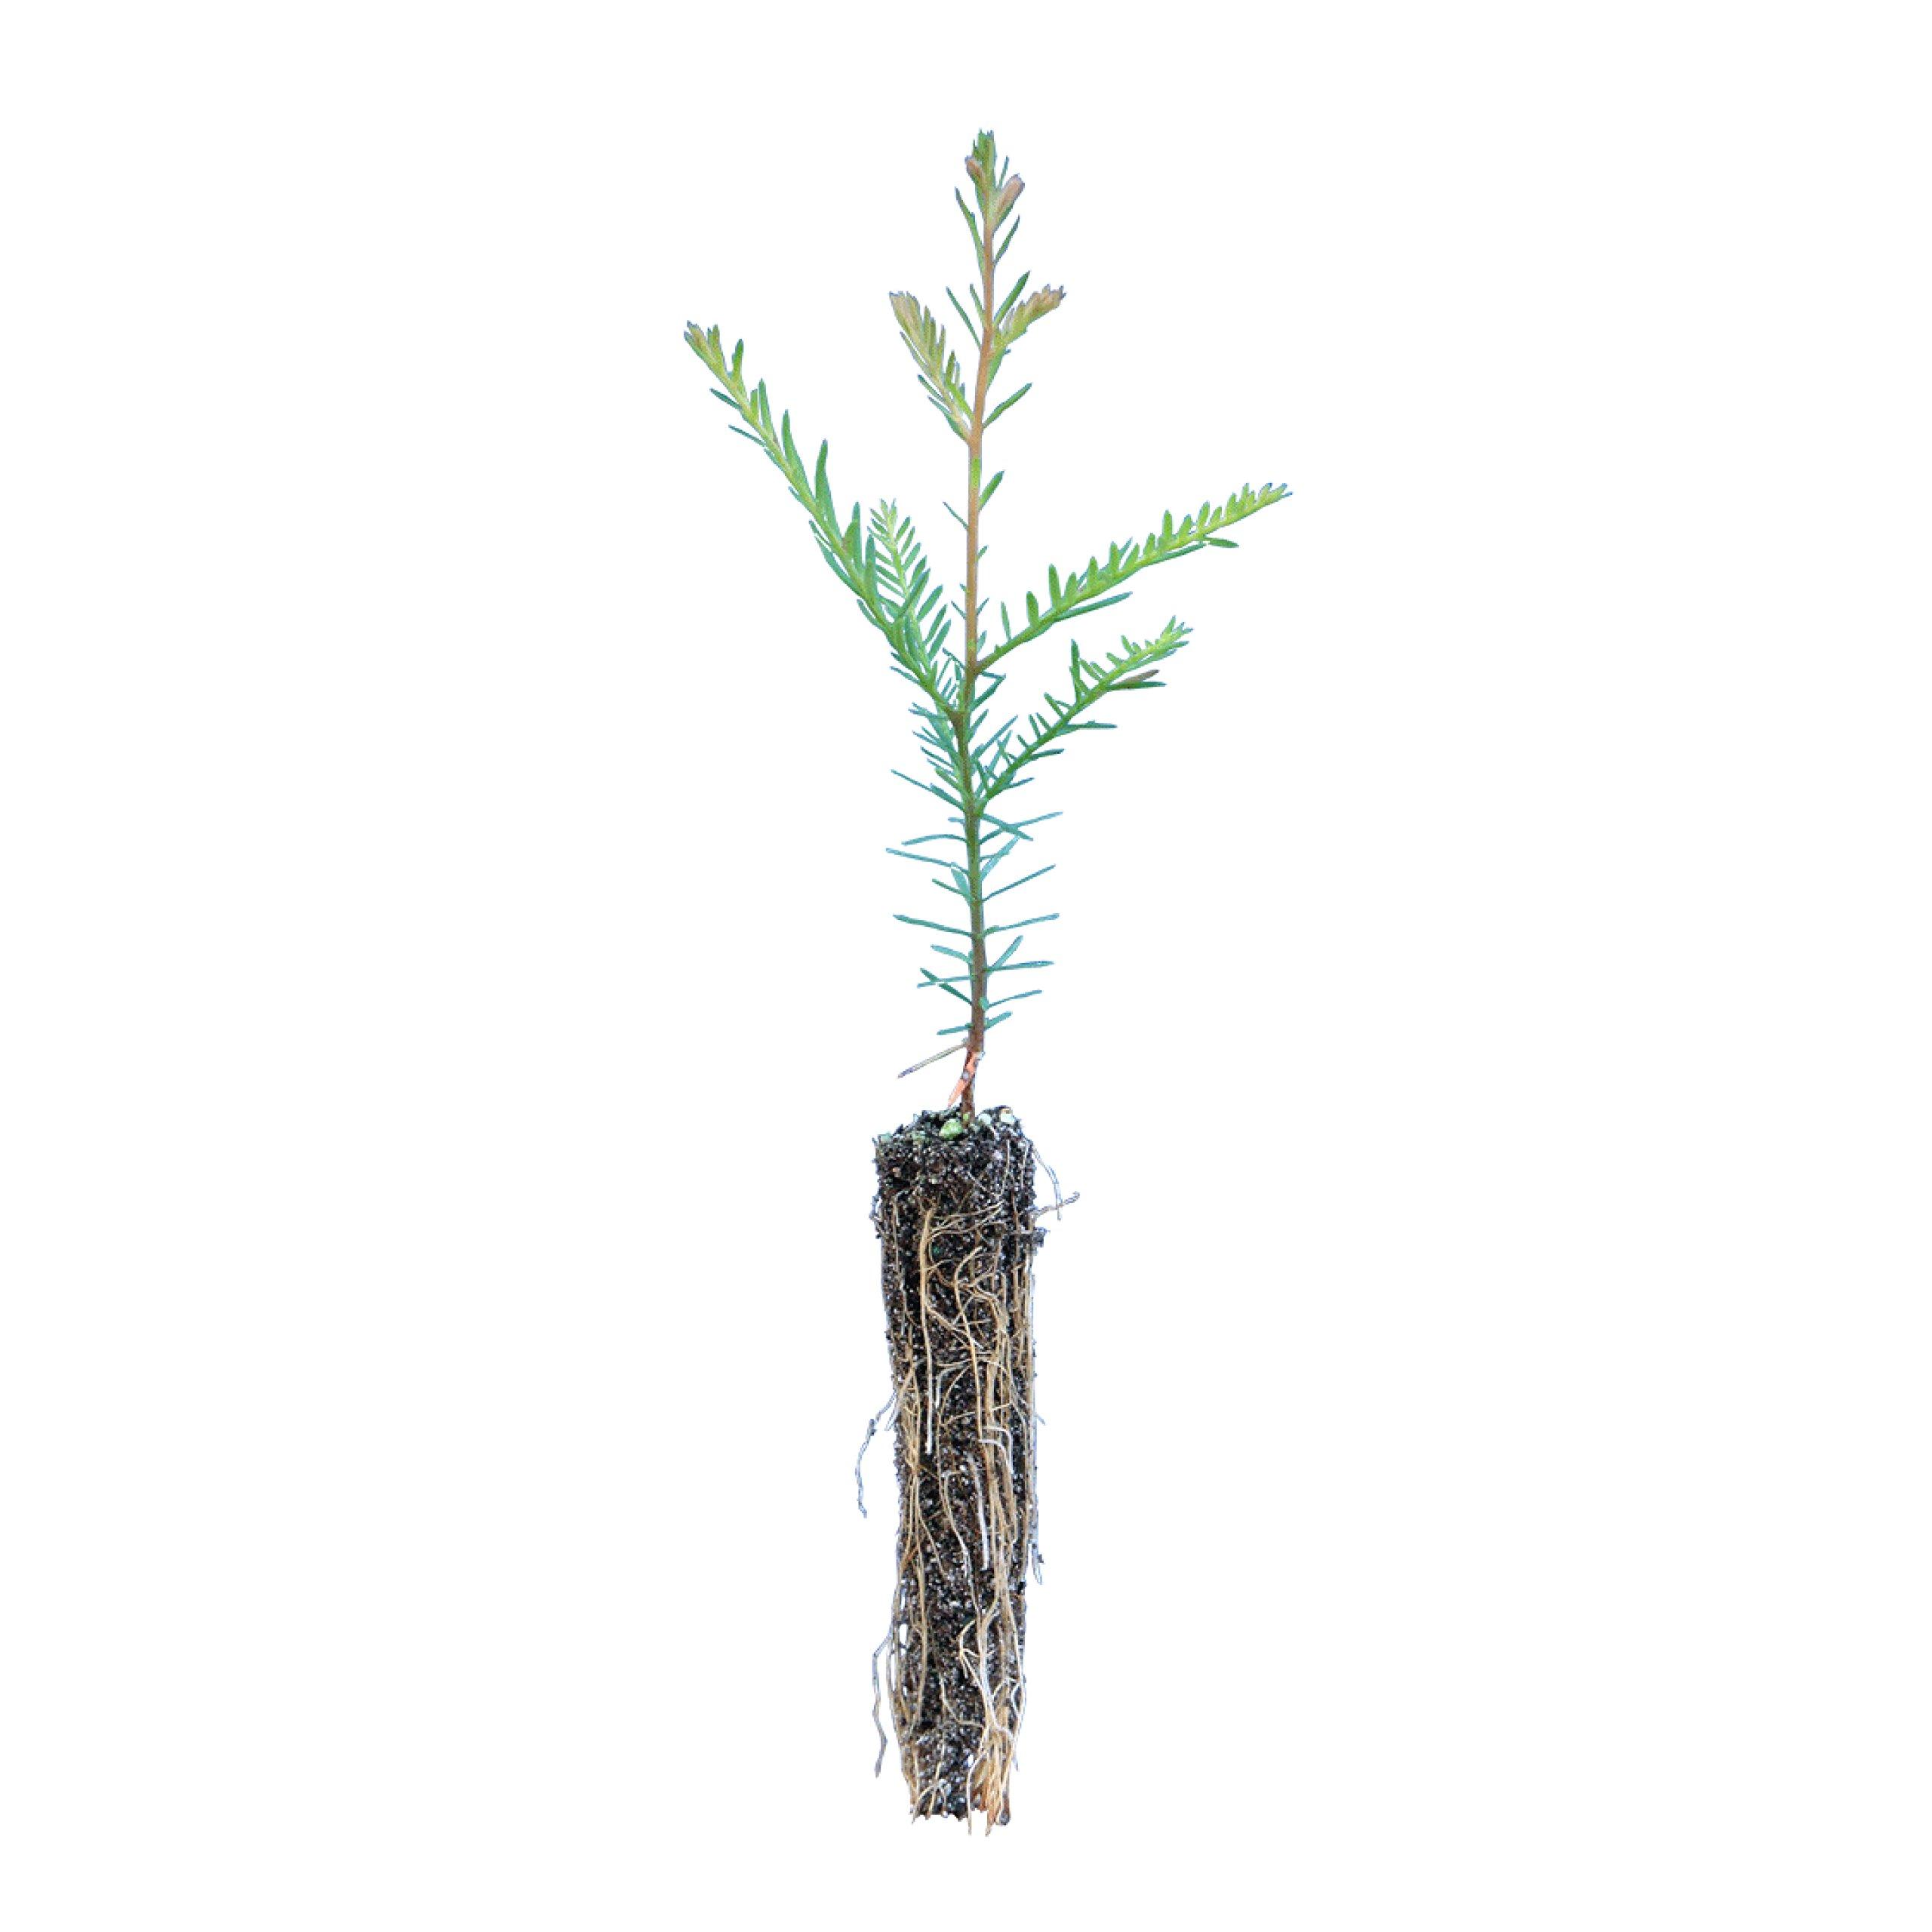 Coast Redwood | Small Tree Seedling | The Jonsteen Company